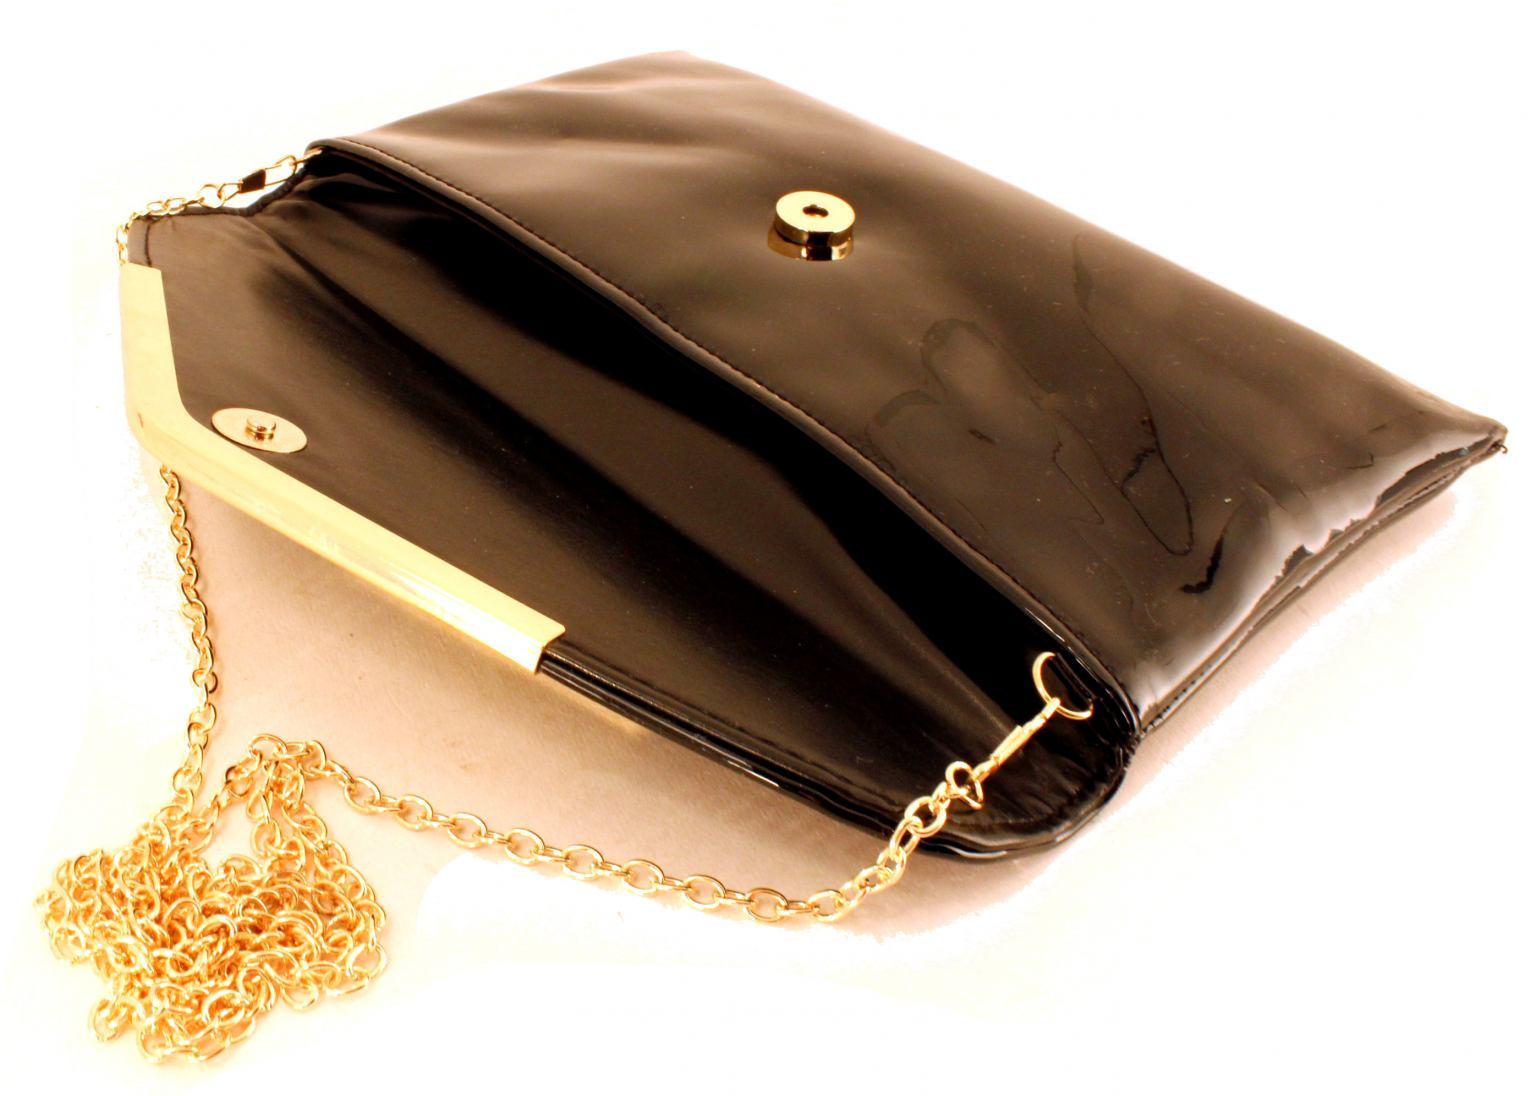 Clutch L. Credi Klara schwarz gold Kuvert glänzend Lack